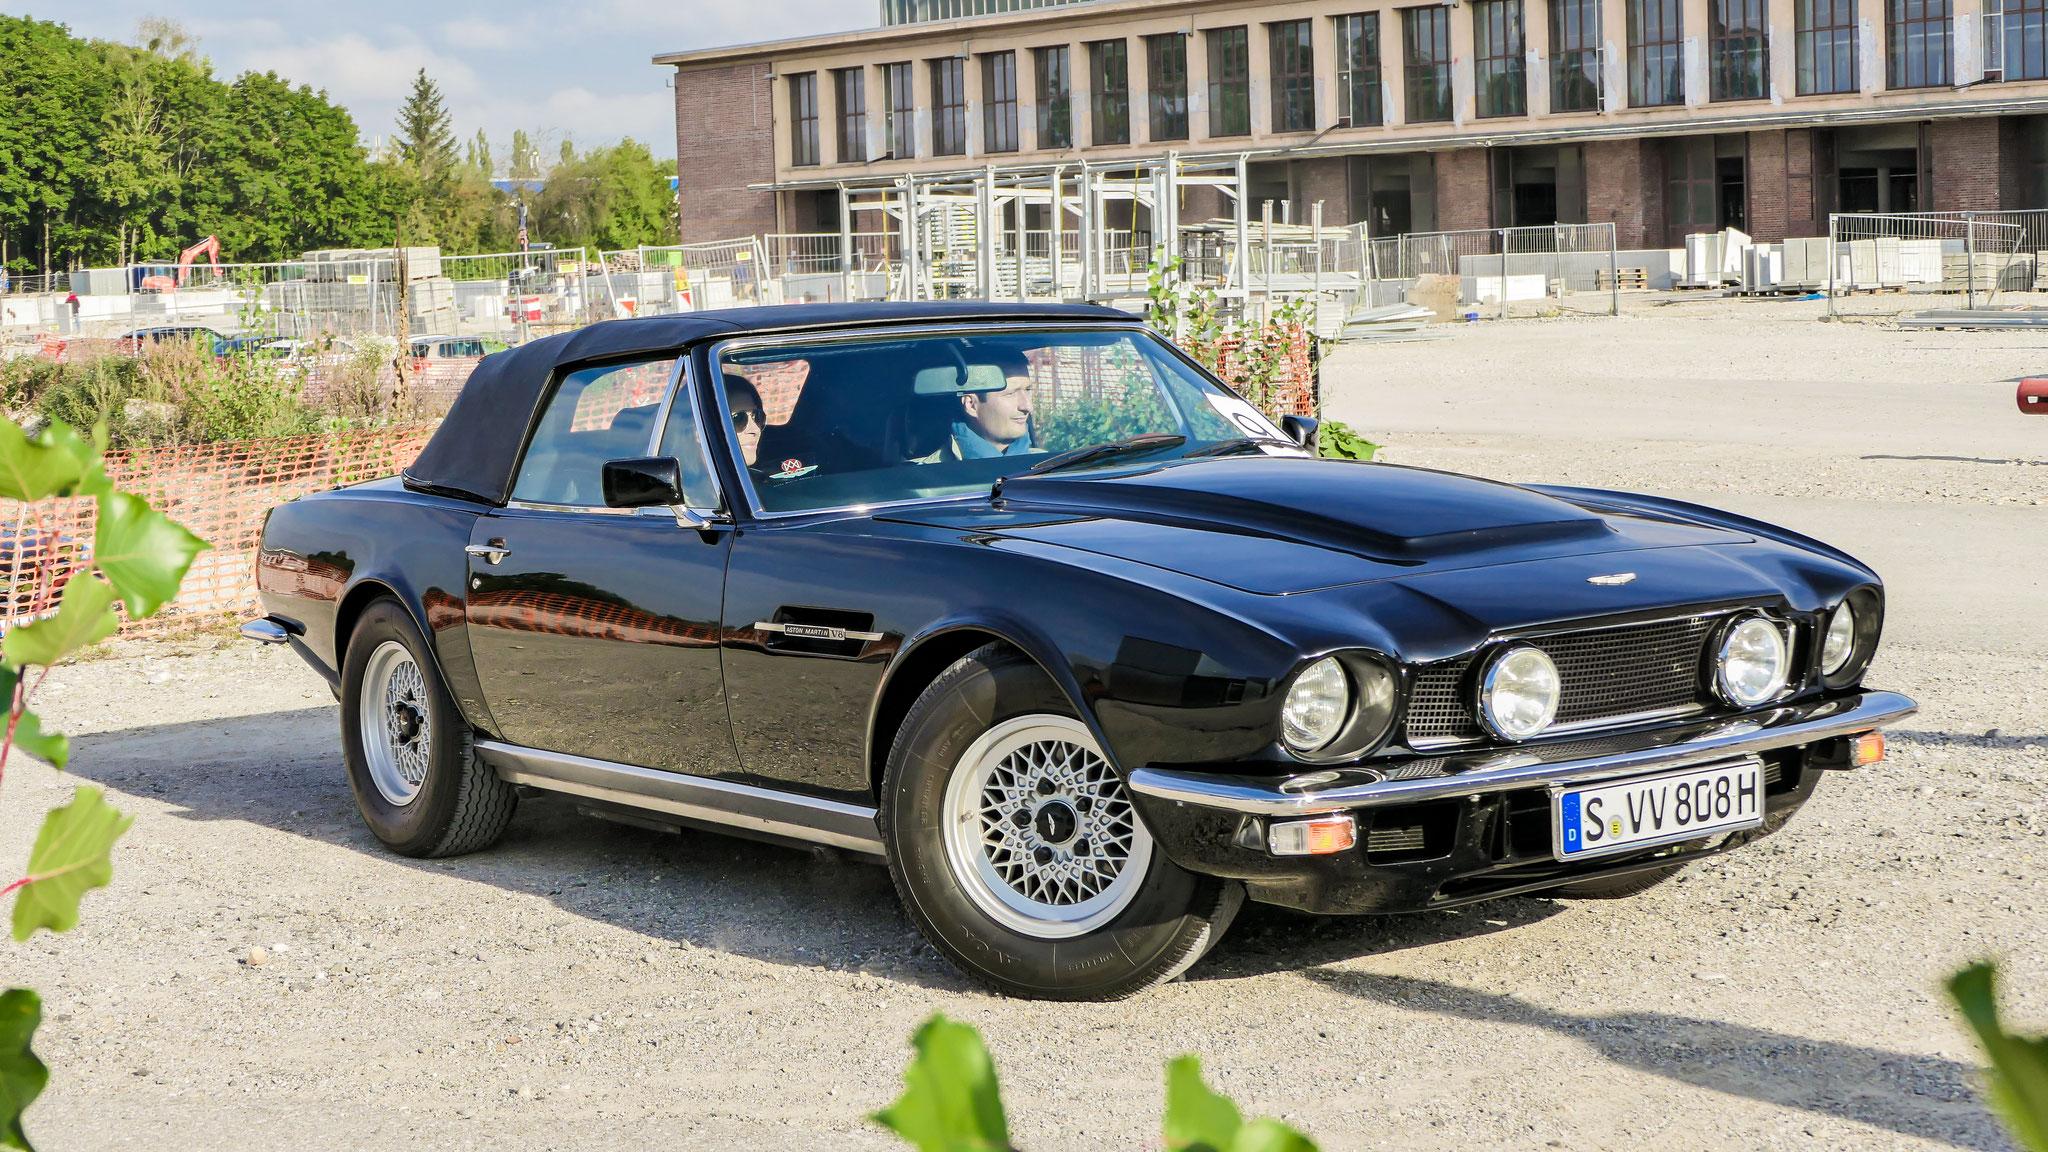 Aston Martin V8 Vantage 1983 - S-VV-808H